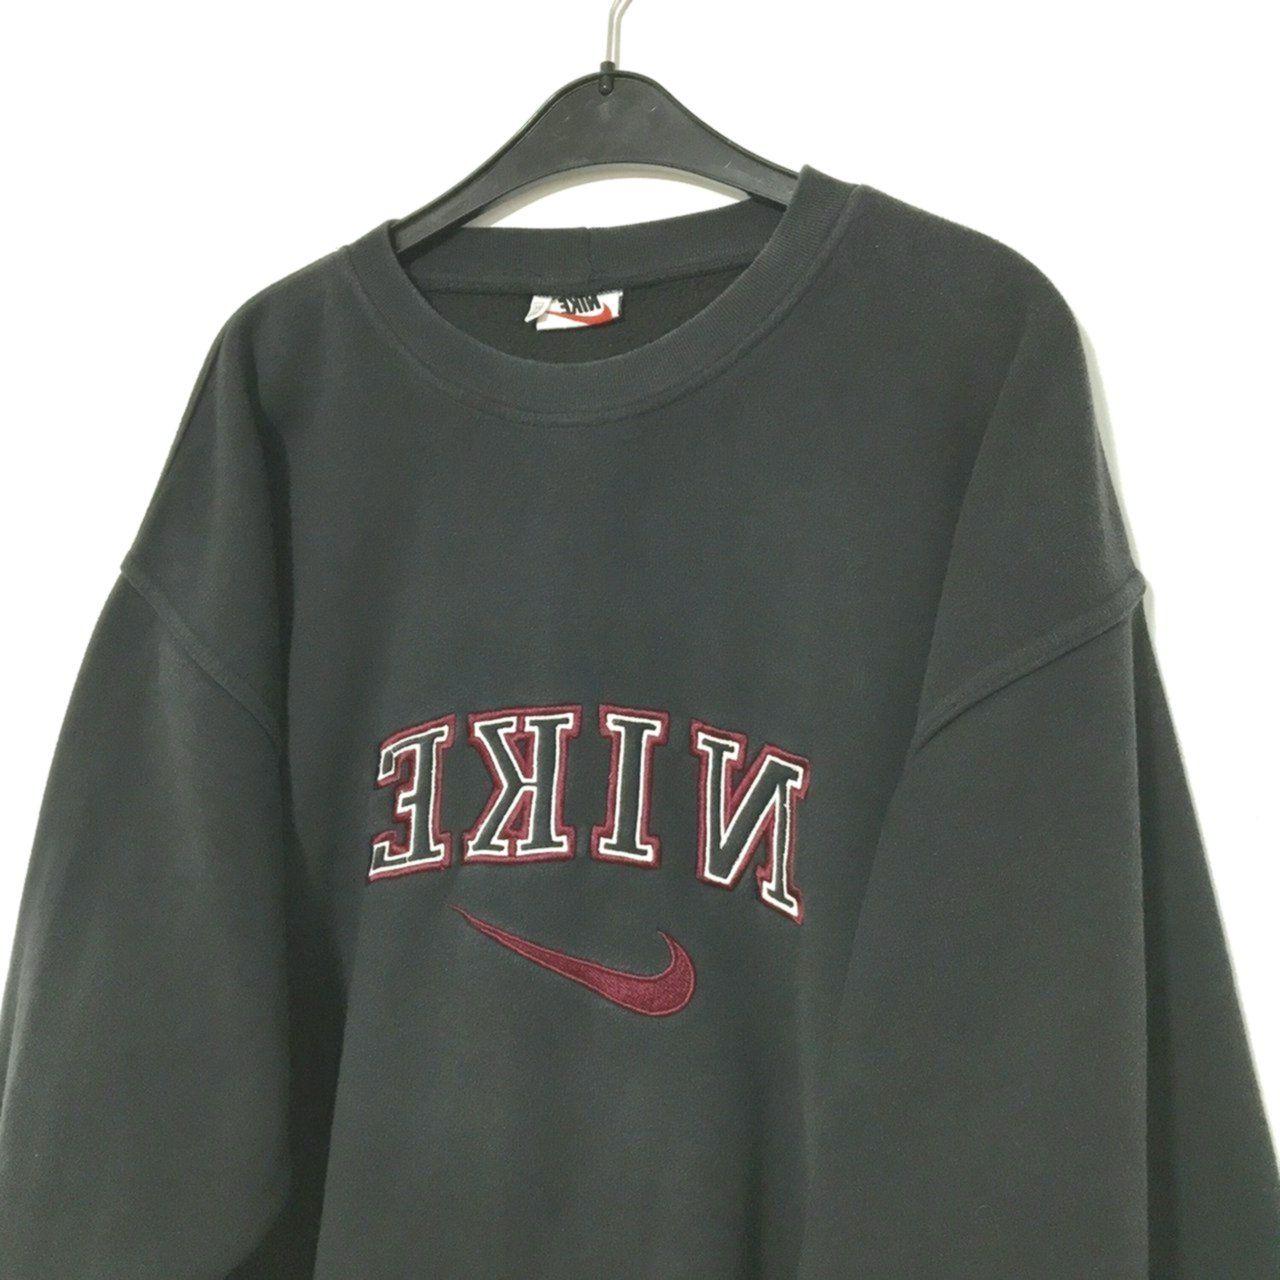 Vintage Nike Sweatshirt Size Xxl Great Condition To Pit To Depop Buyvint Vintage Nike Sweatshirt Nike Vintage Sweatshirt Vintage Sweatshirt [ 1280 x 1280 Pixel ]